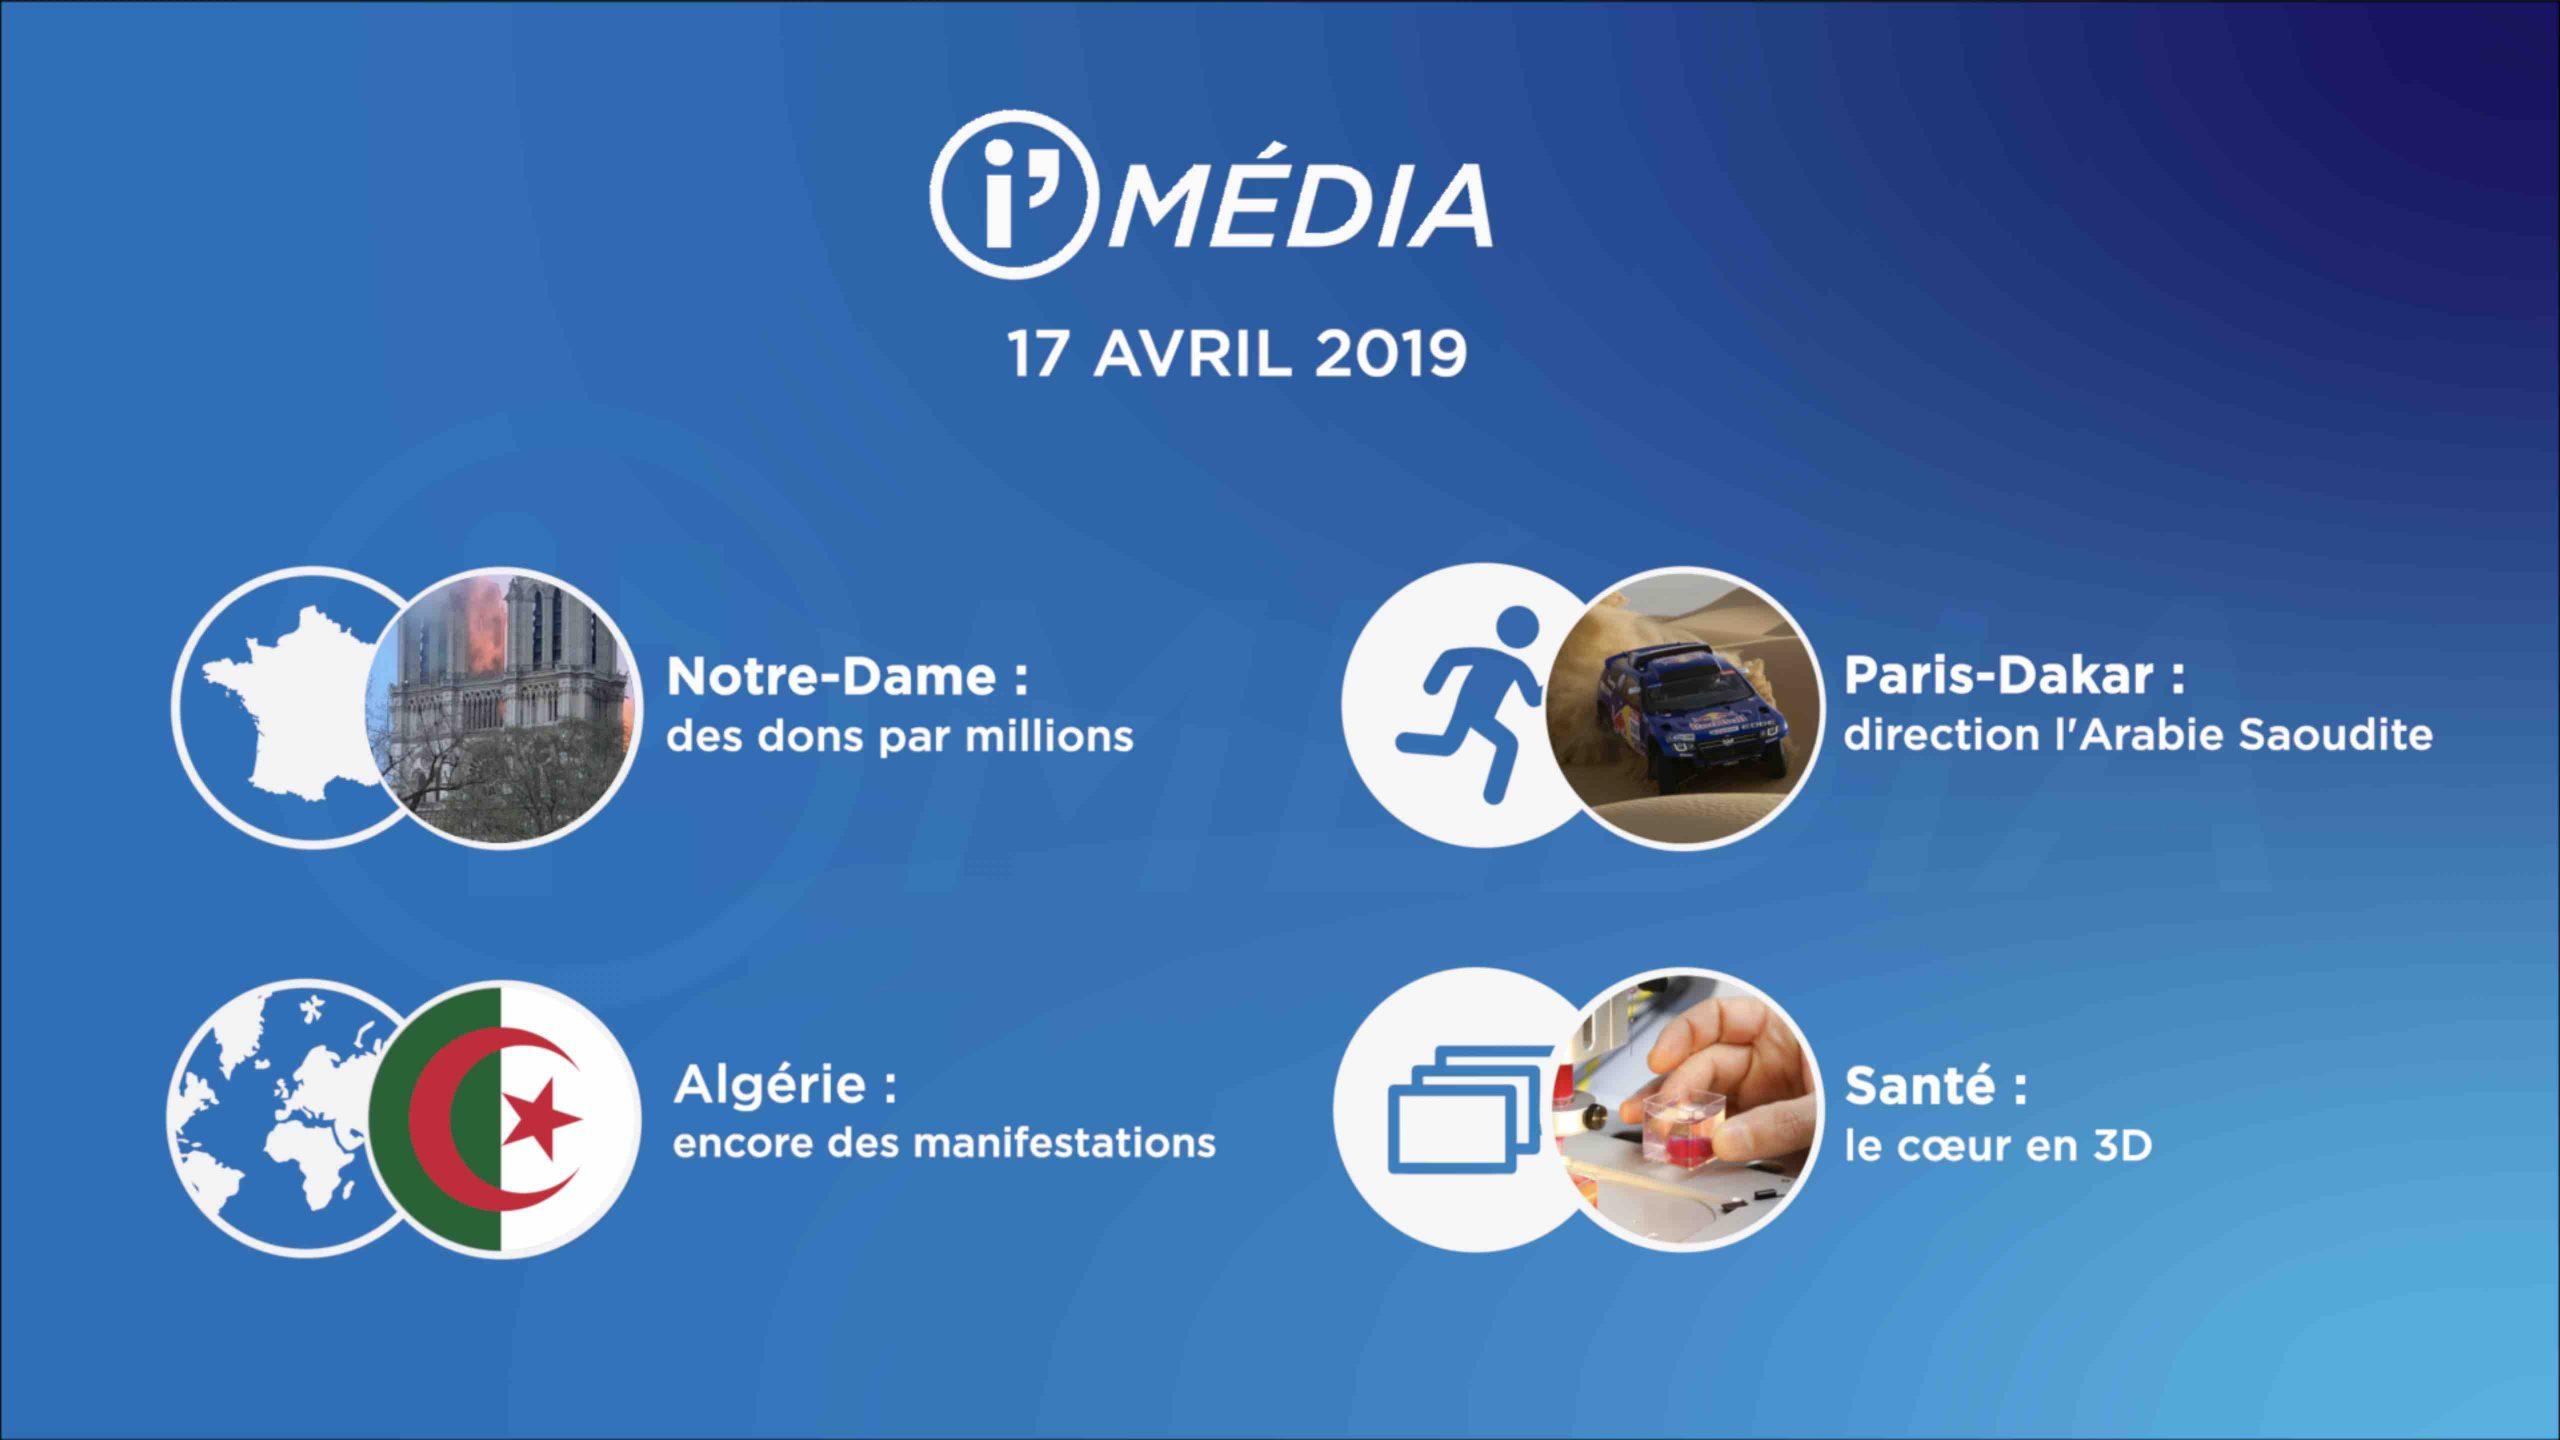 imedia-17-04-2019